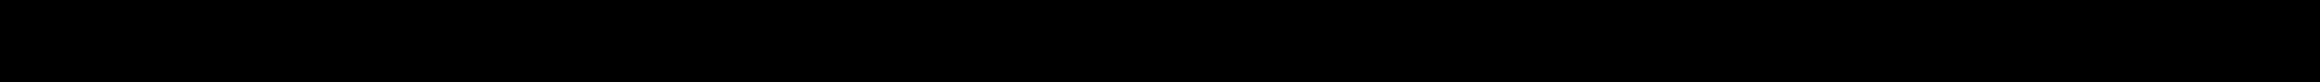 MANN-FILTER 1F0 129 620, 3C0 129 620 Luftfilter